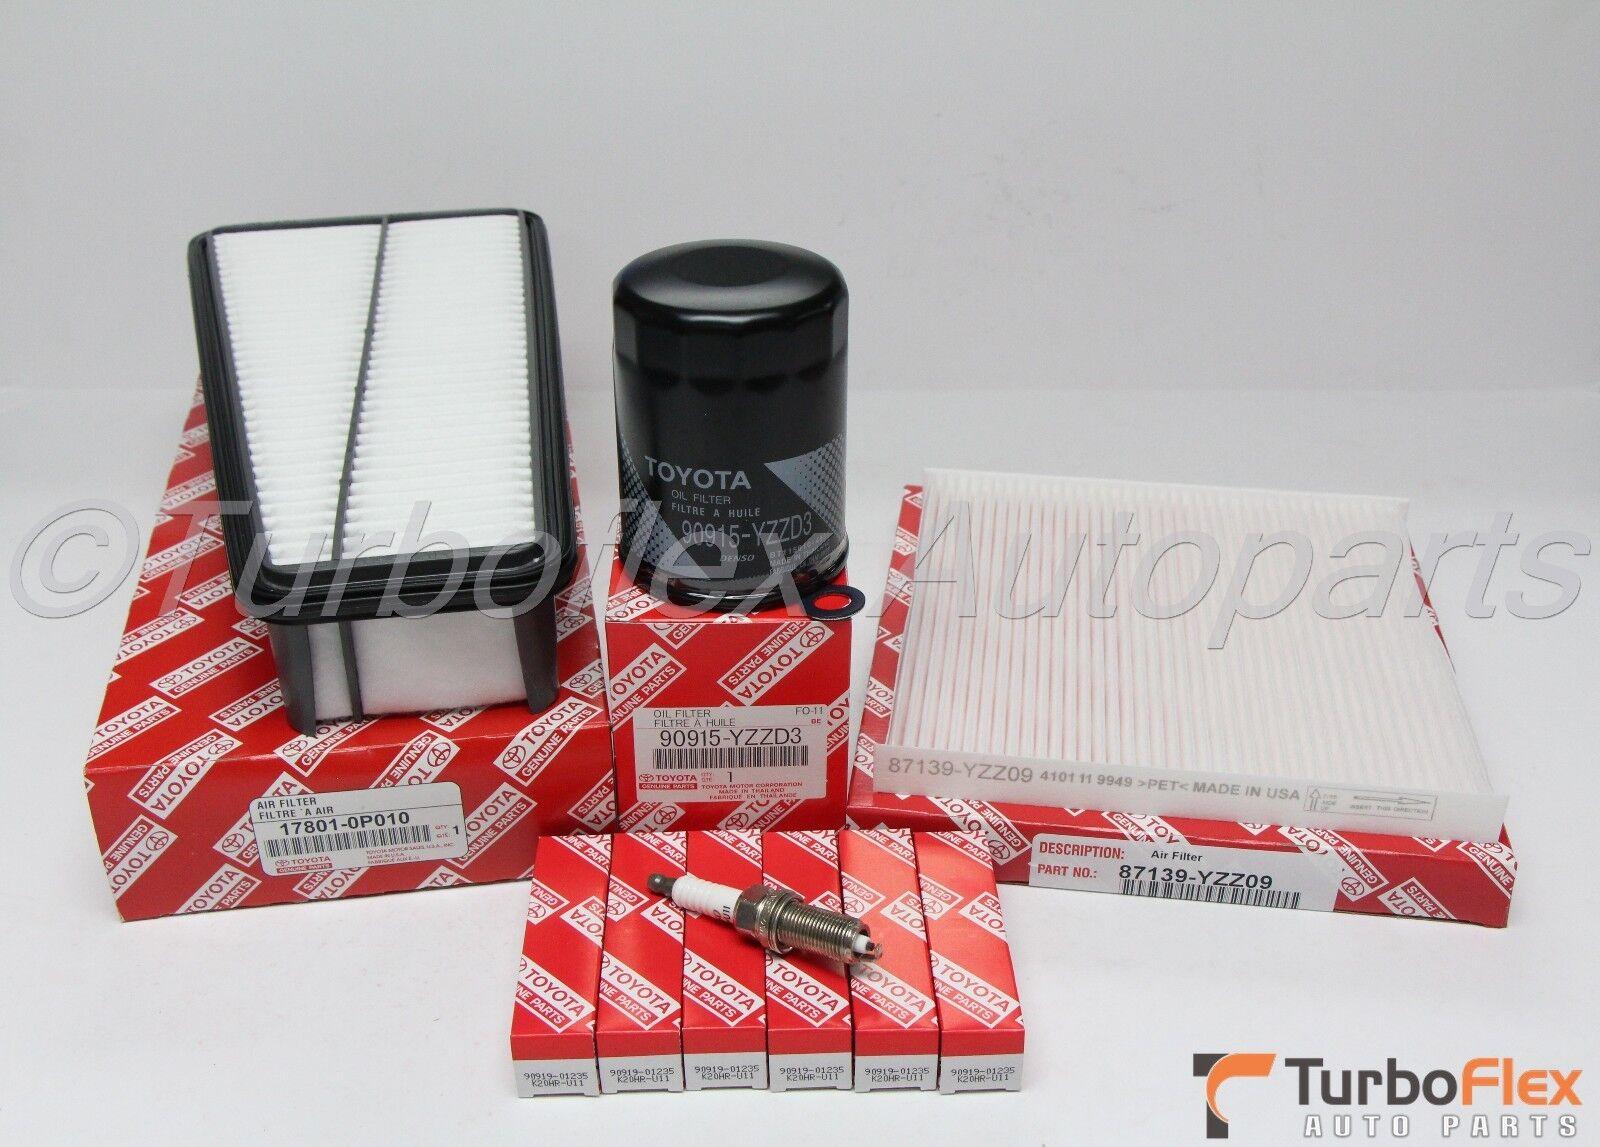 Toyota Tacoma 2006-2015 V6 4.0L Service Tune up Kit Genuine OEM